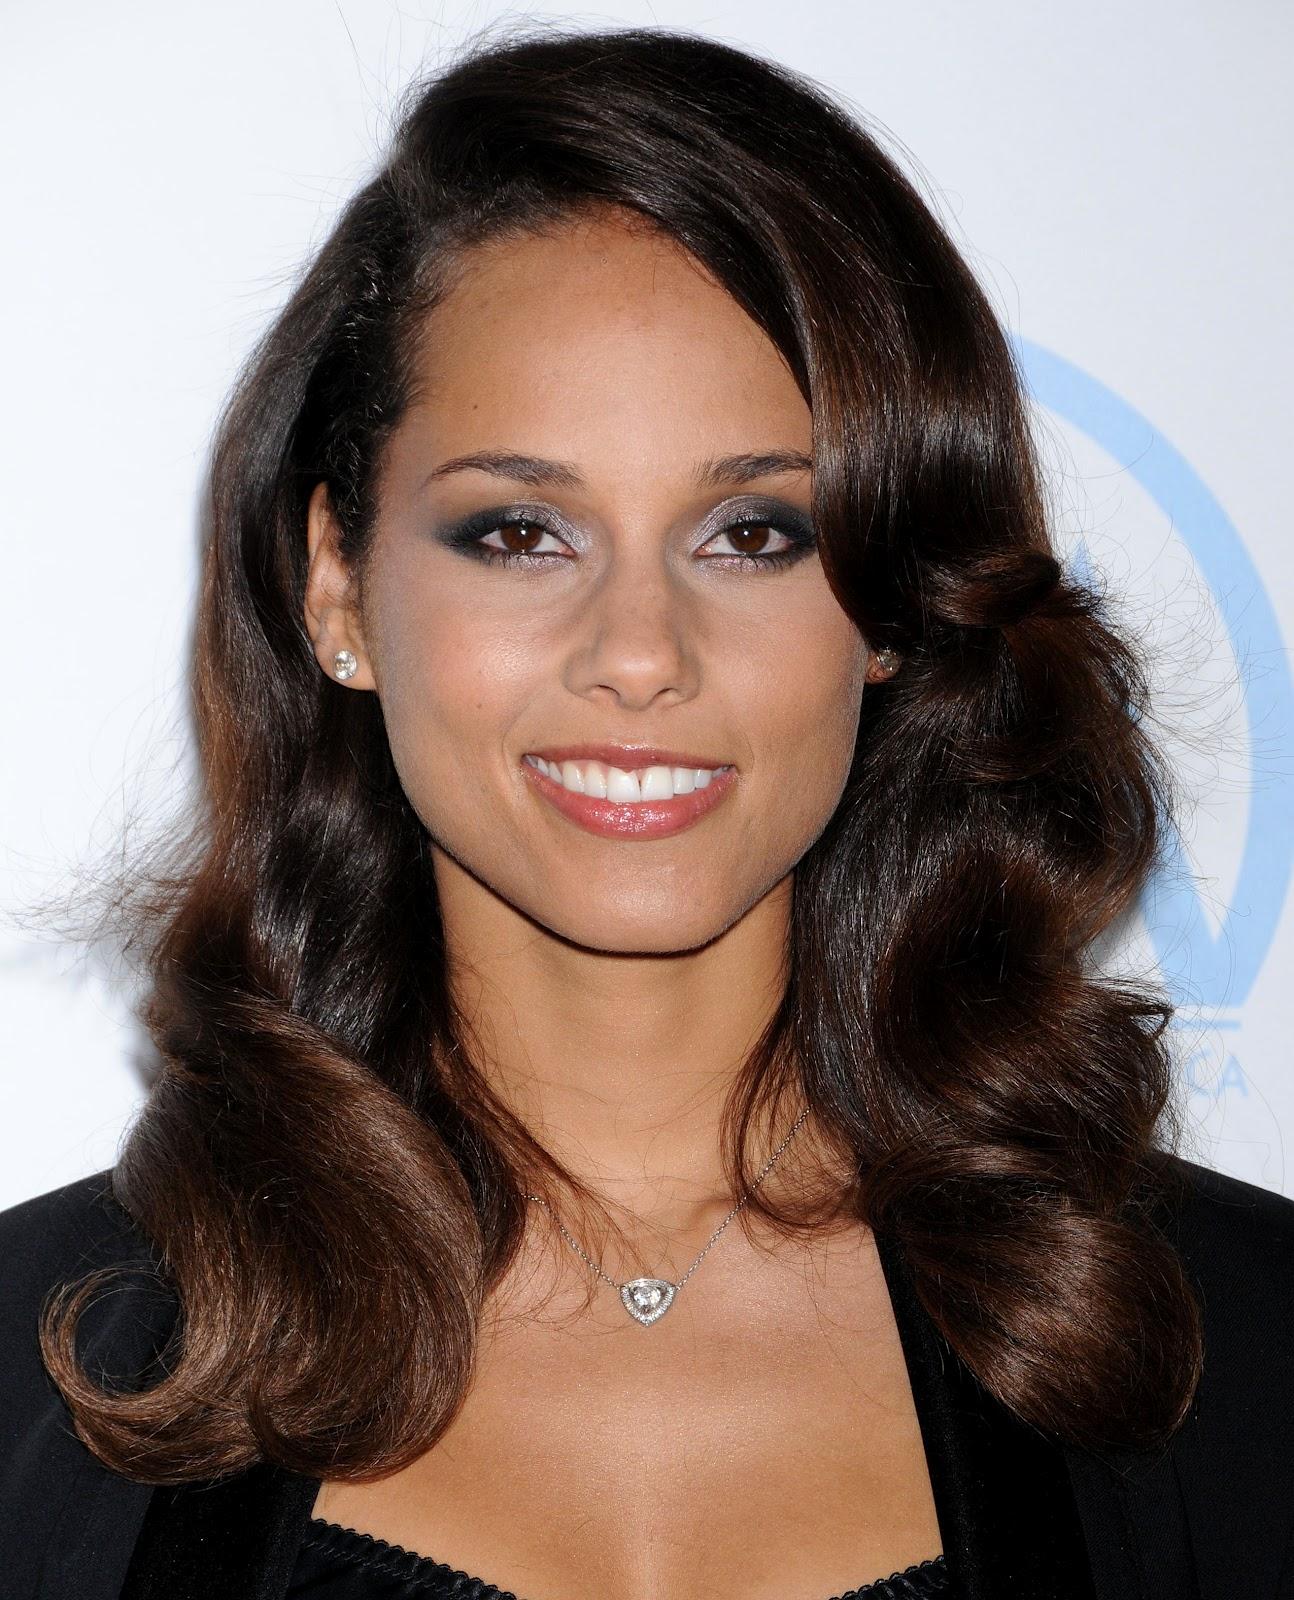 Alicia Keys Profile and Pics | Wallpaper HD And Background Alicia Keys